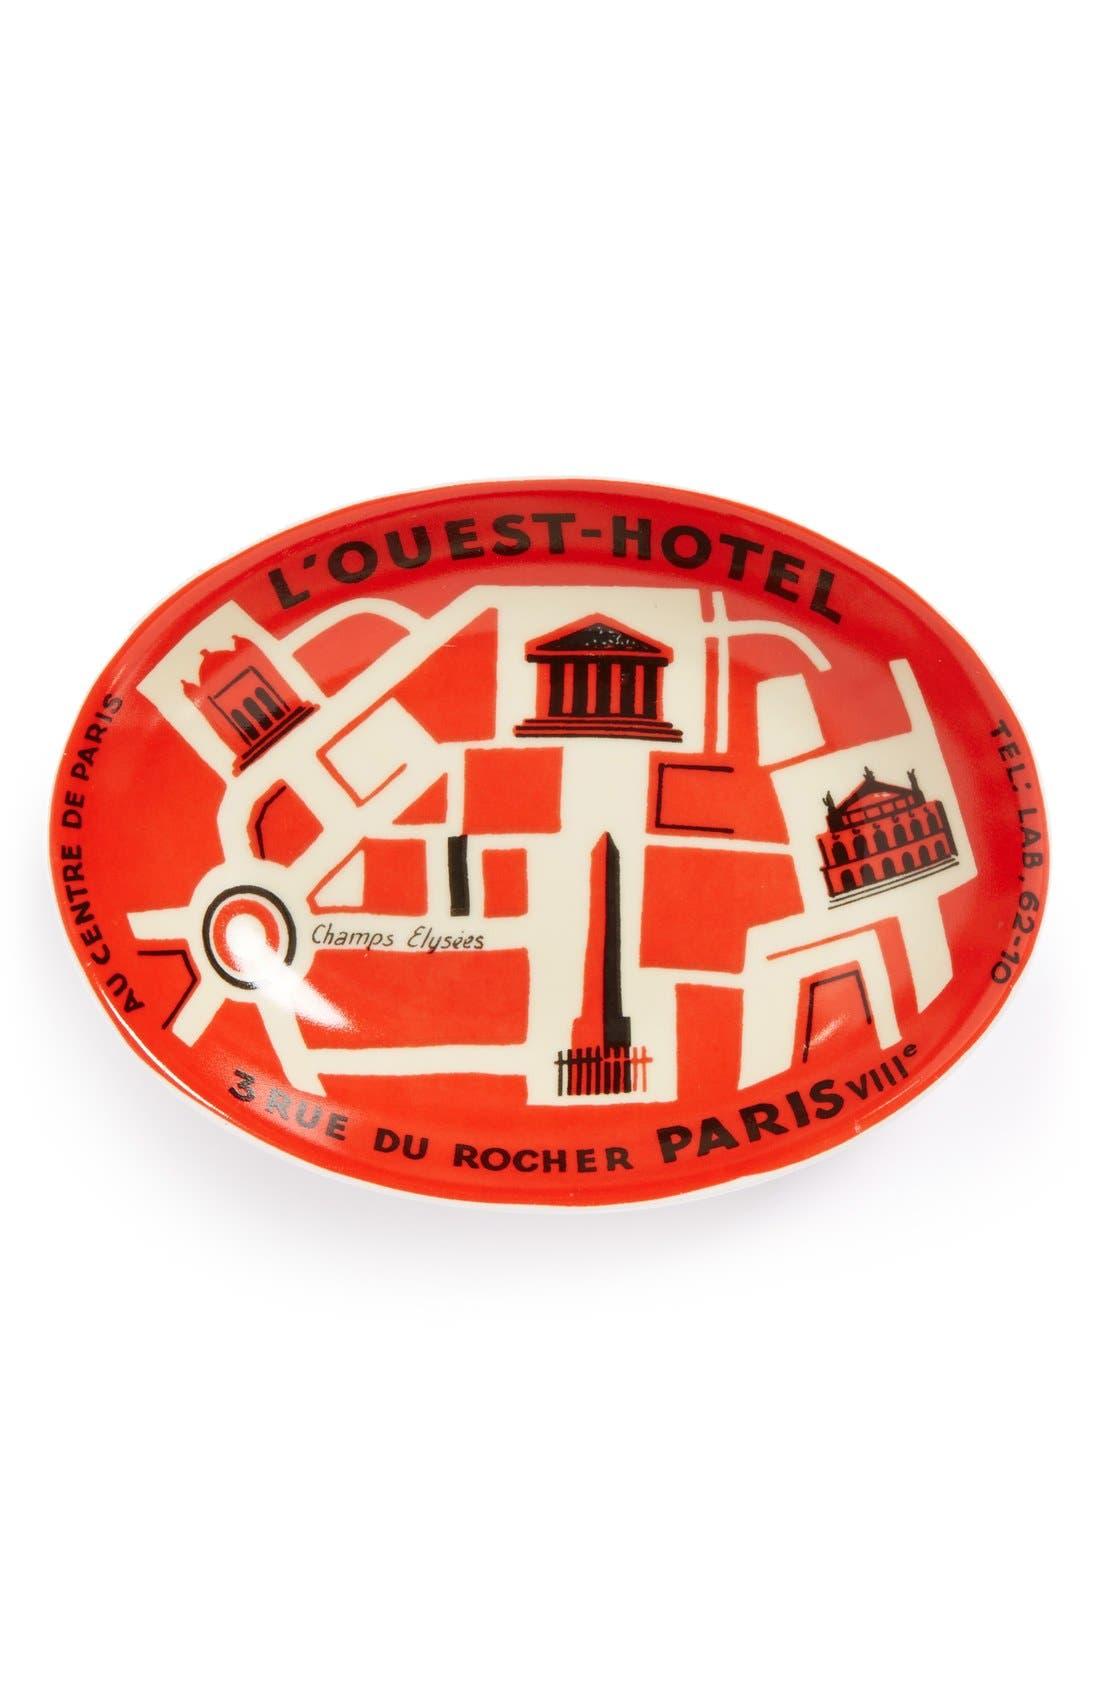 Alternate Image 1 Selected - Rosanna 'Voyage - L'Ouest Hotel' Porcelain Tray